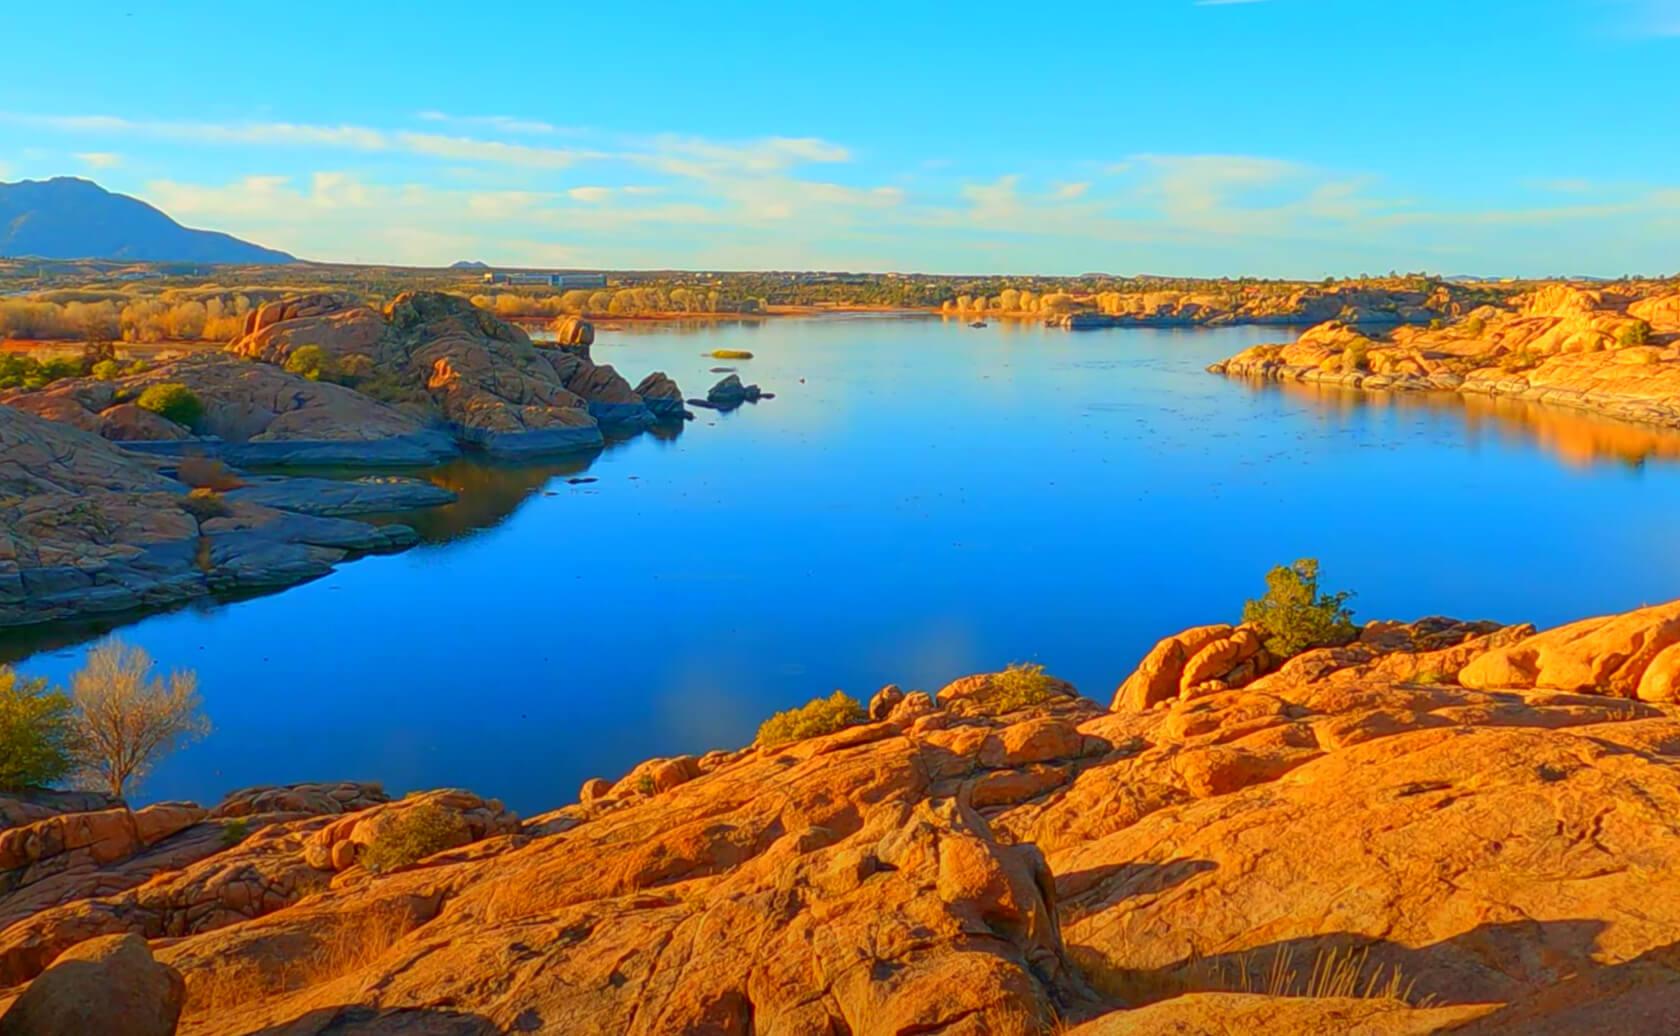 Willow-Lake-Fishing-Guide-Report-Arizona-04